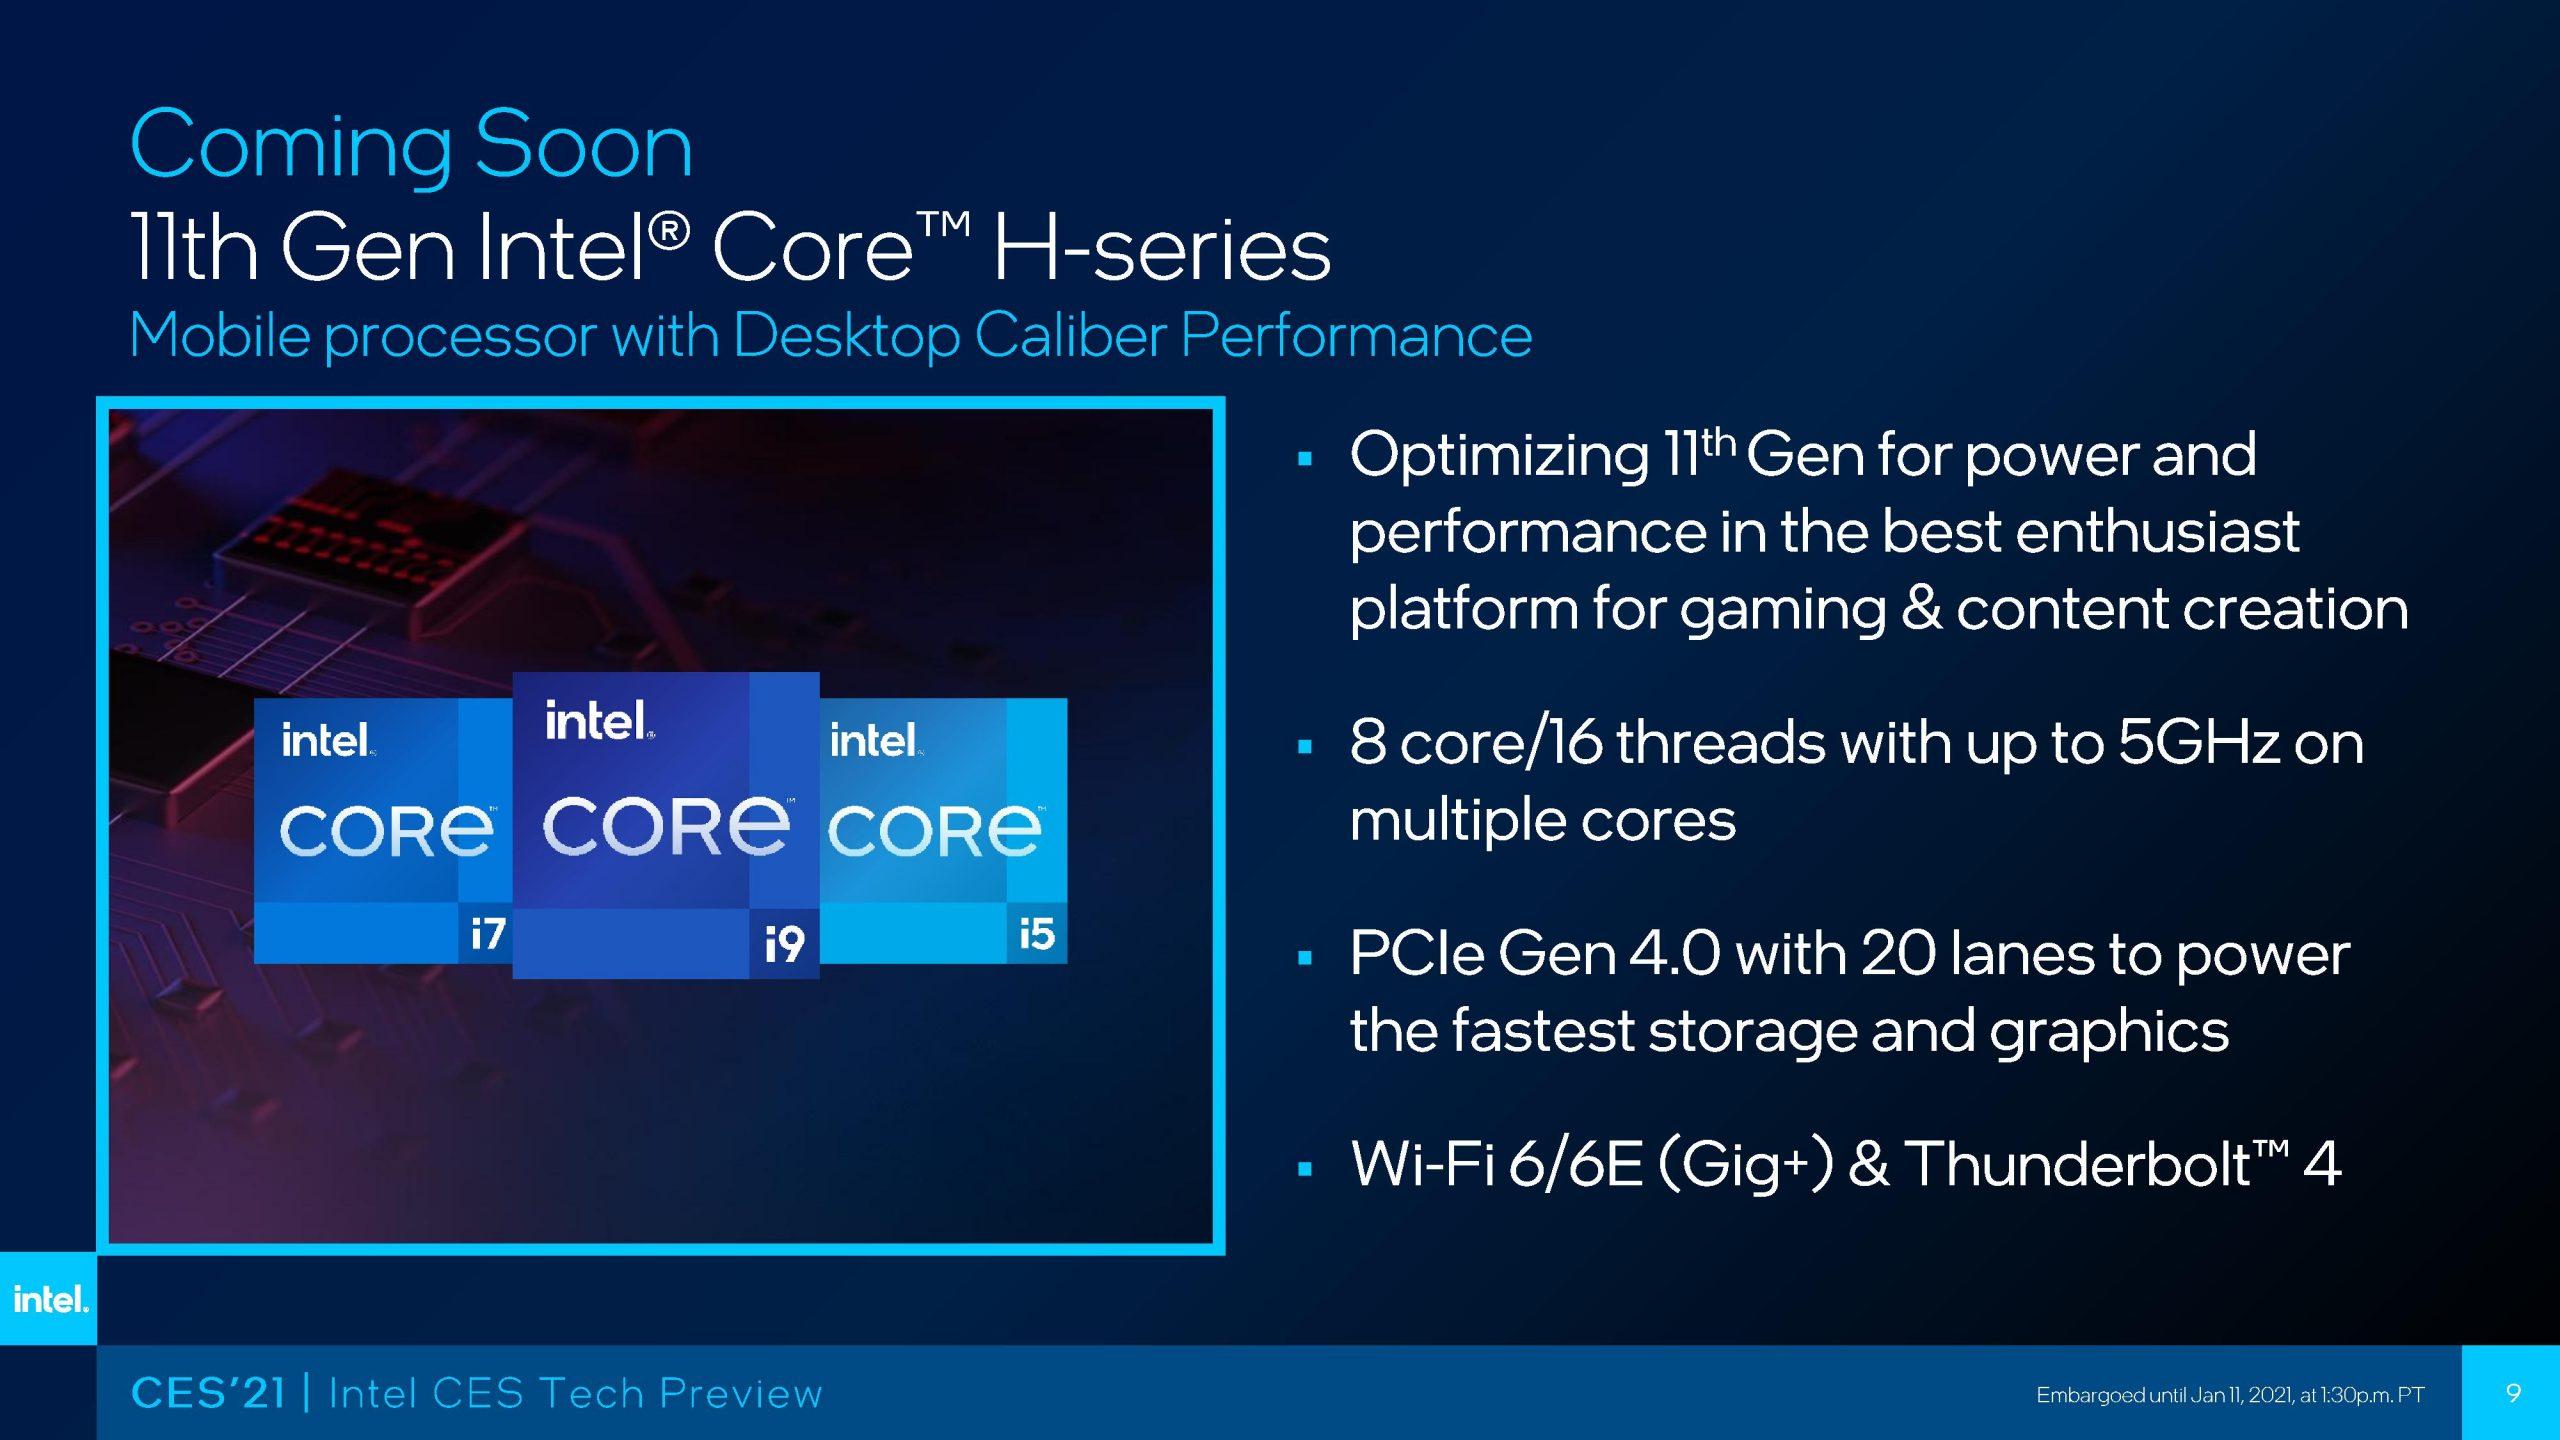 Se confirman las especificaciones del Intel Core i9-11900H; Core i7-11800H y Core i5-11400H